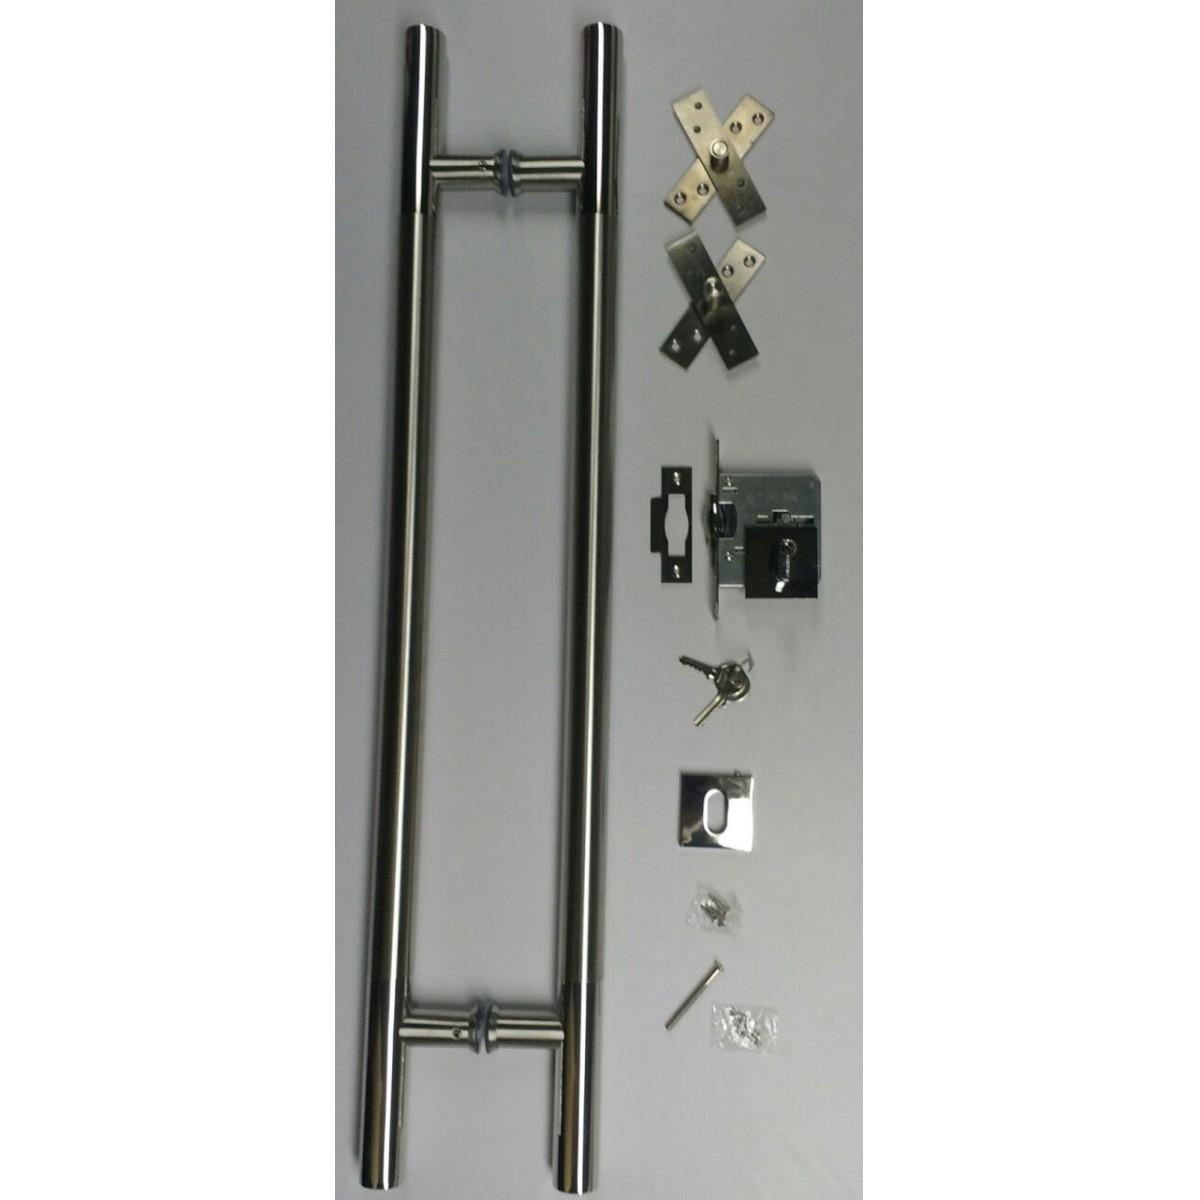 Kit para porta puxador tubolar misto 32 mm fechadura rolete e dobradiça em inox 80 cm